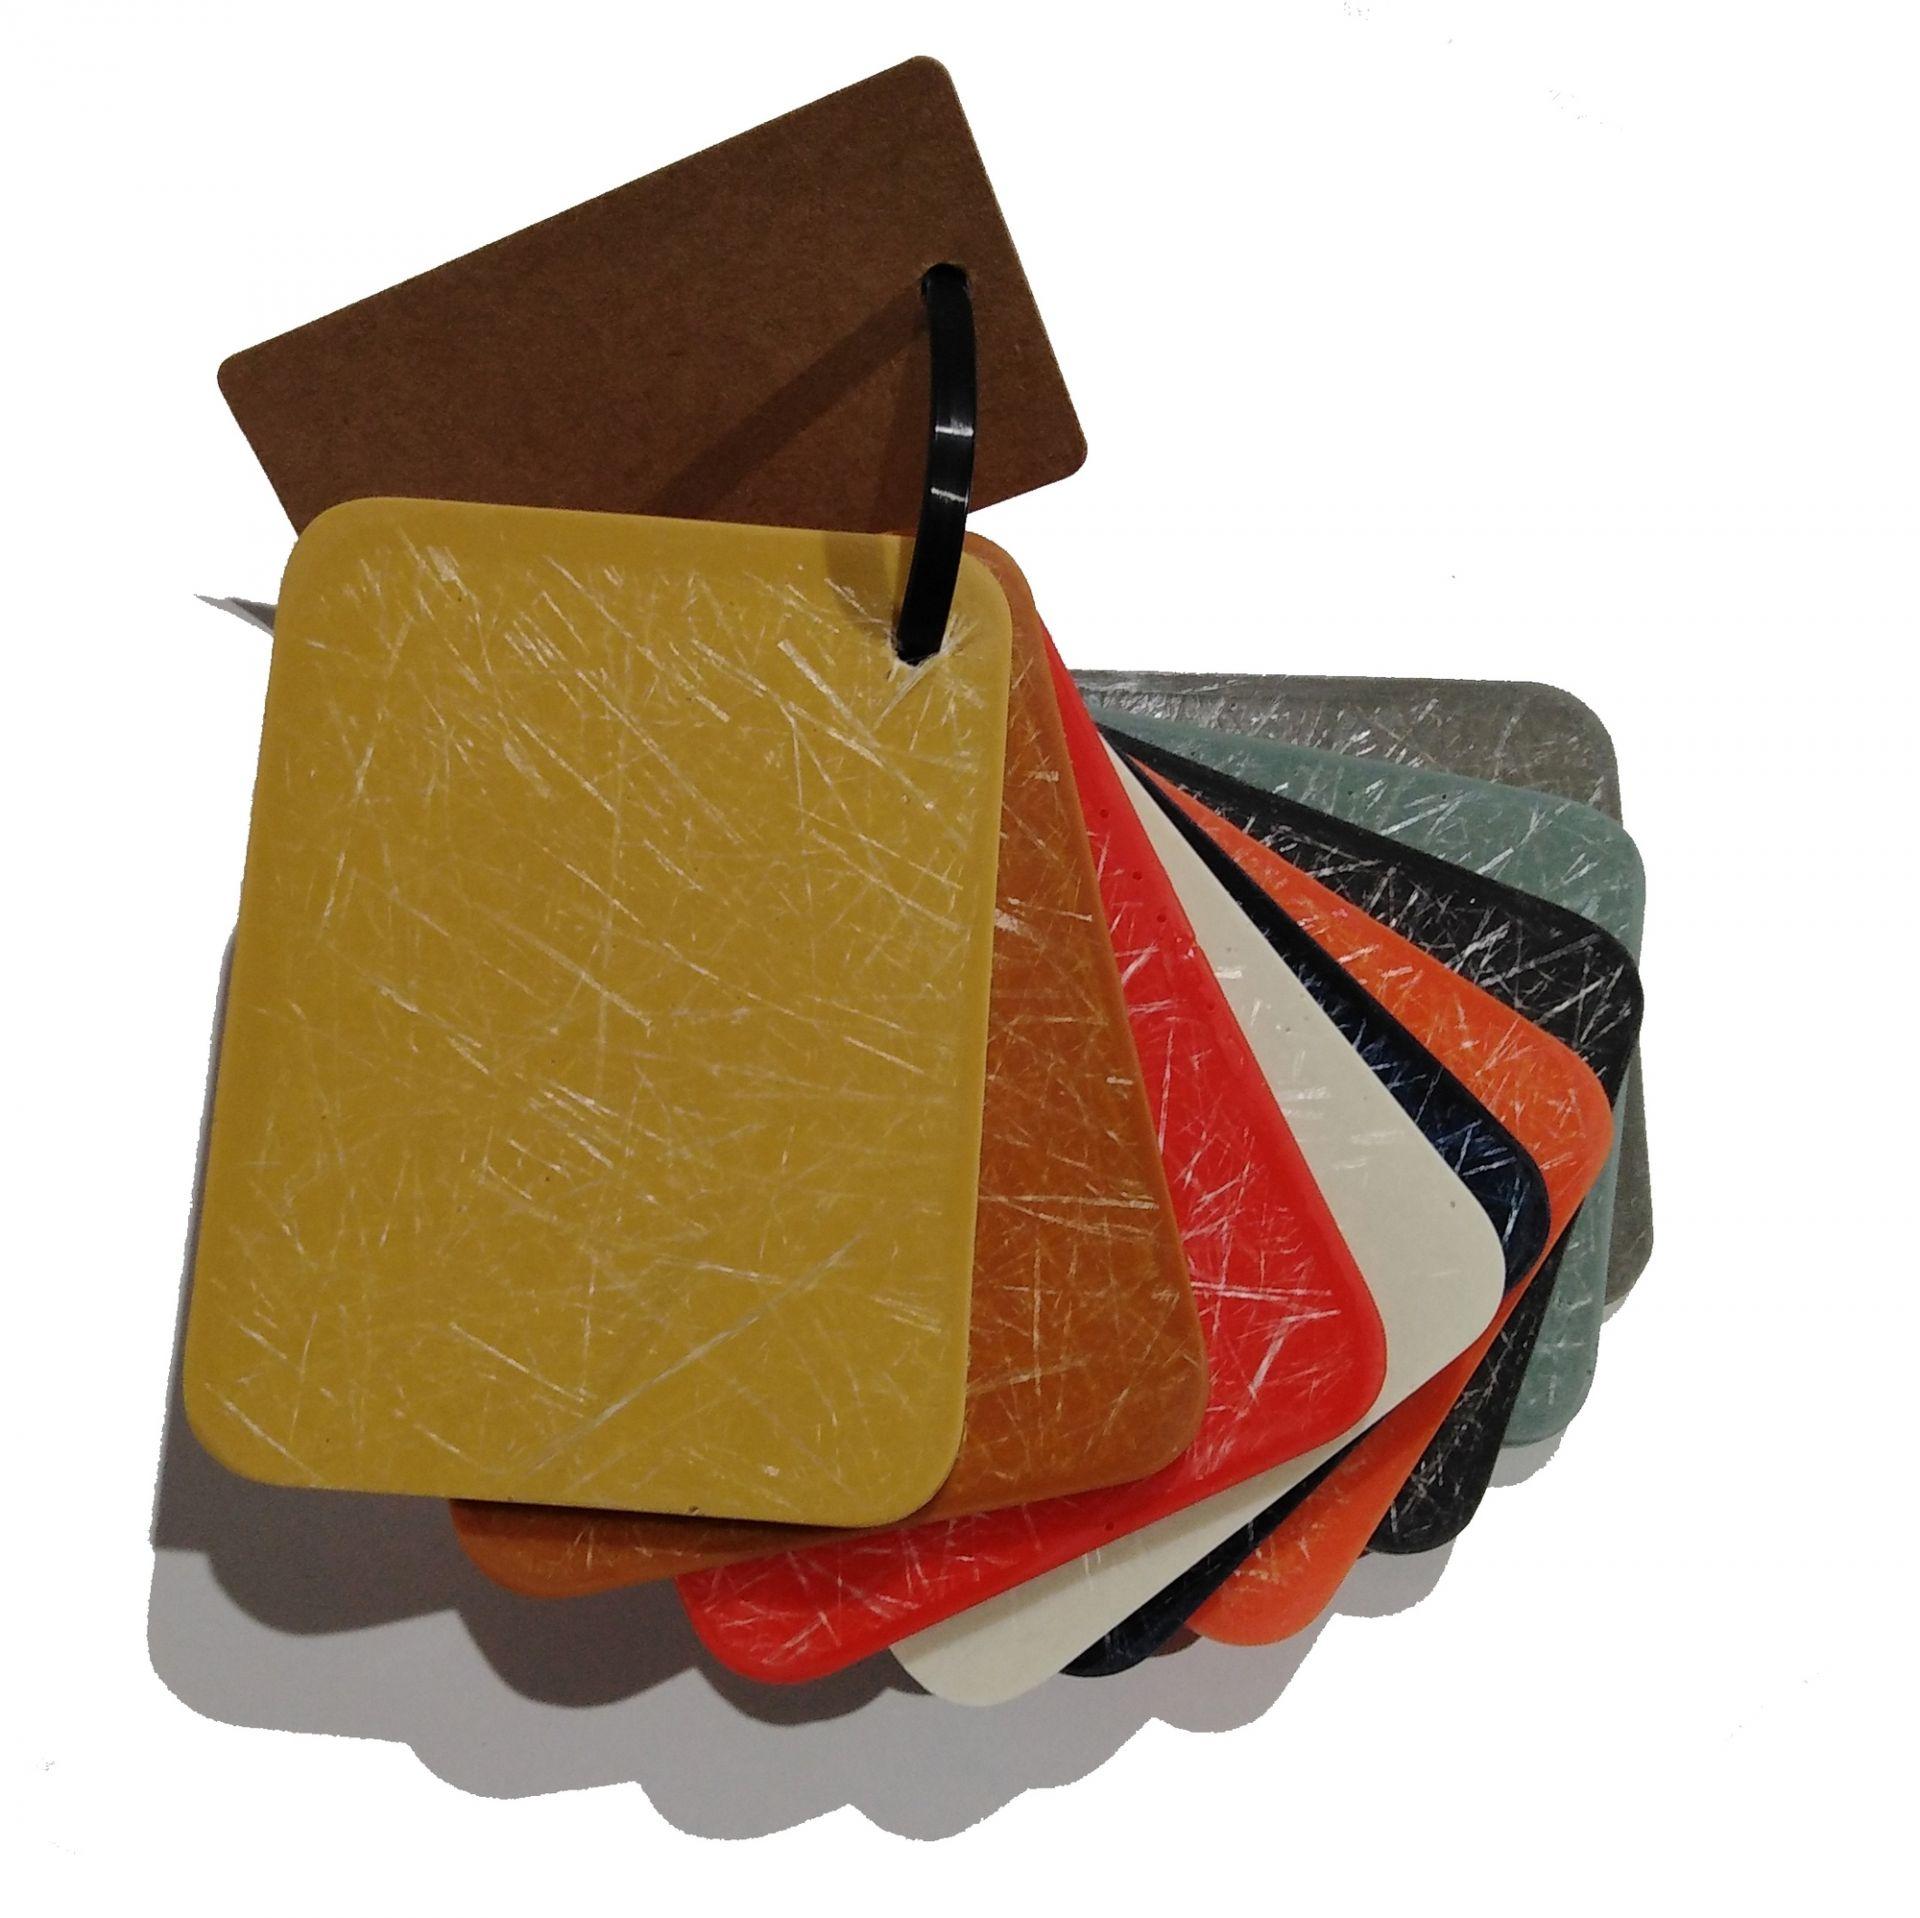 Plastic Sample for Eames Plastic Chairs Fiberglas Vitra